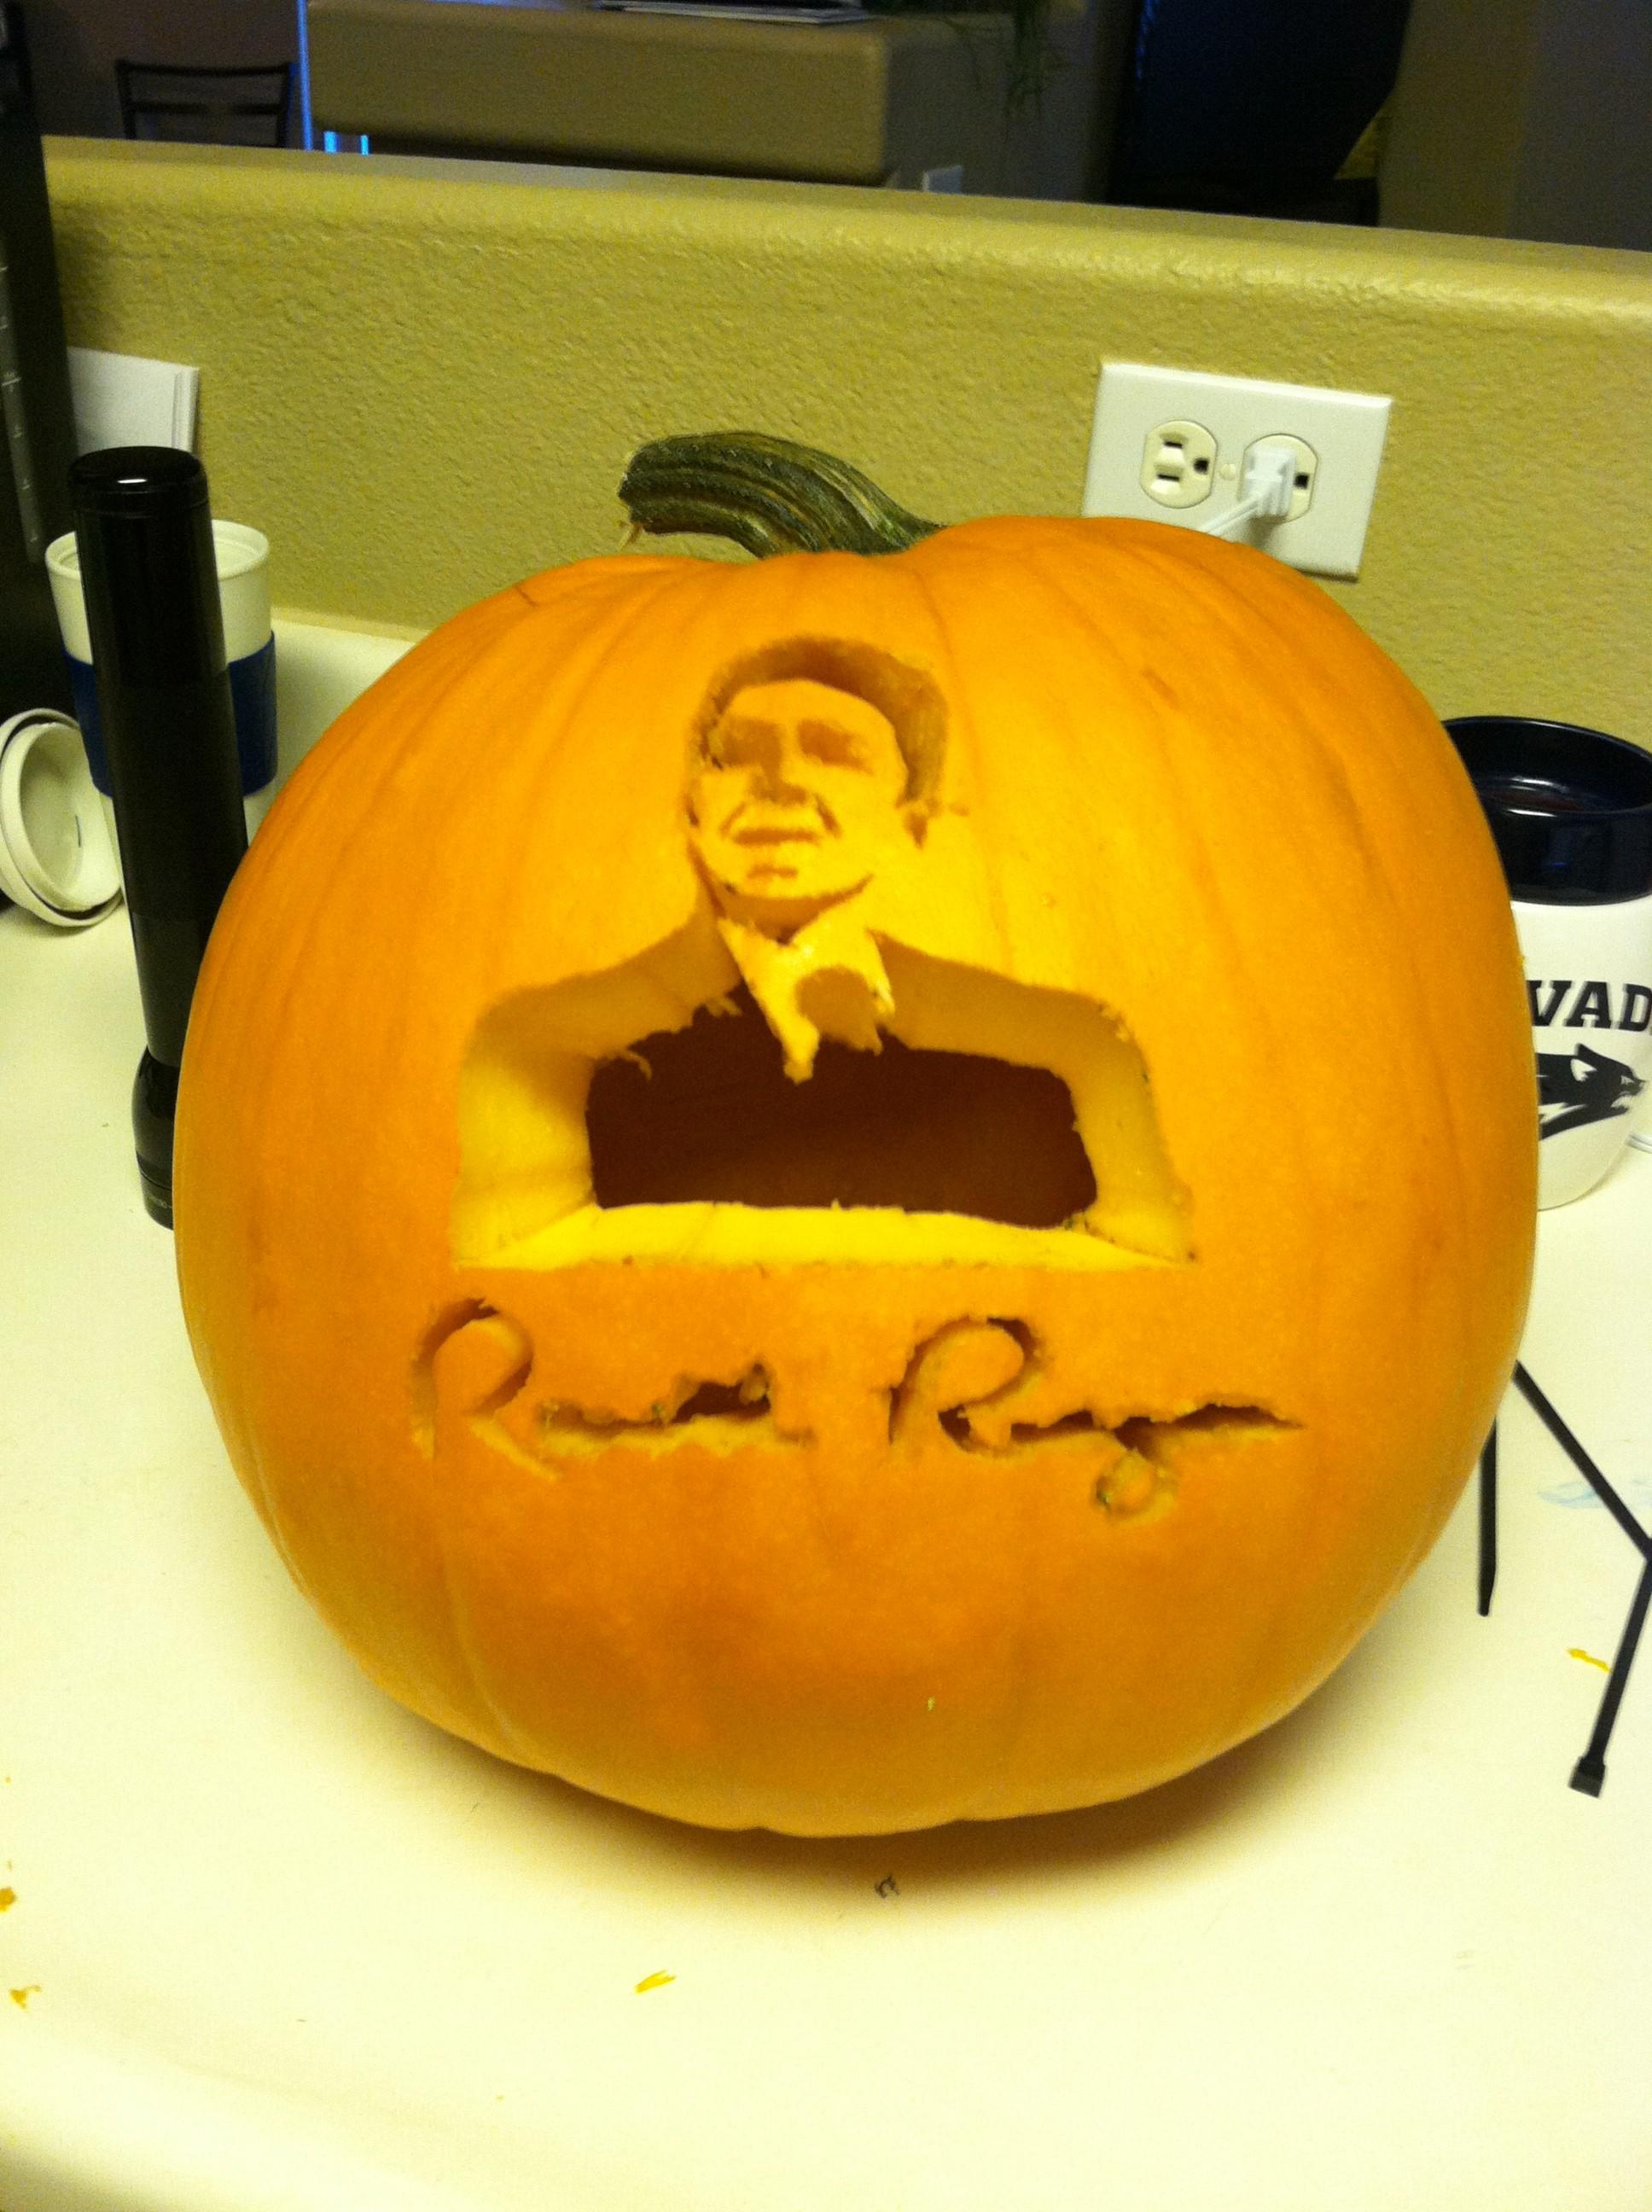 Ronald Reagan won me a pumpkin contest.